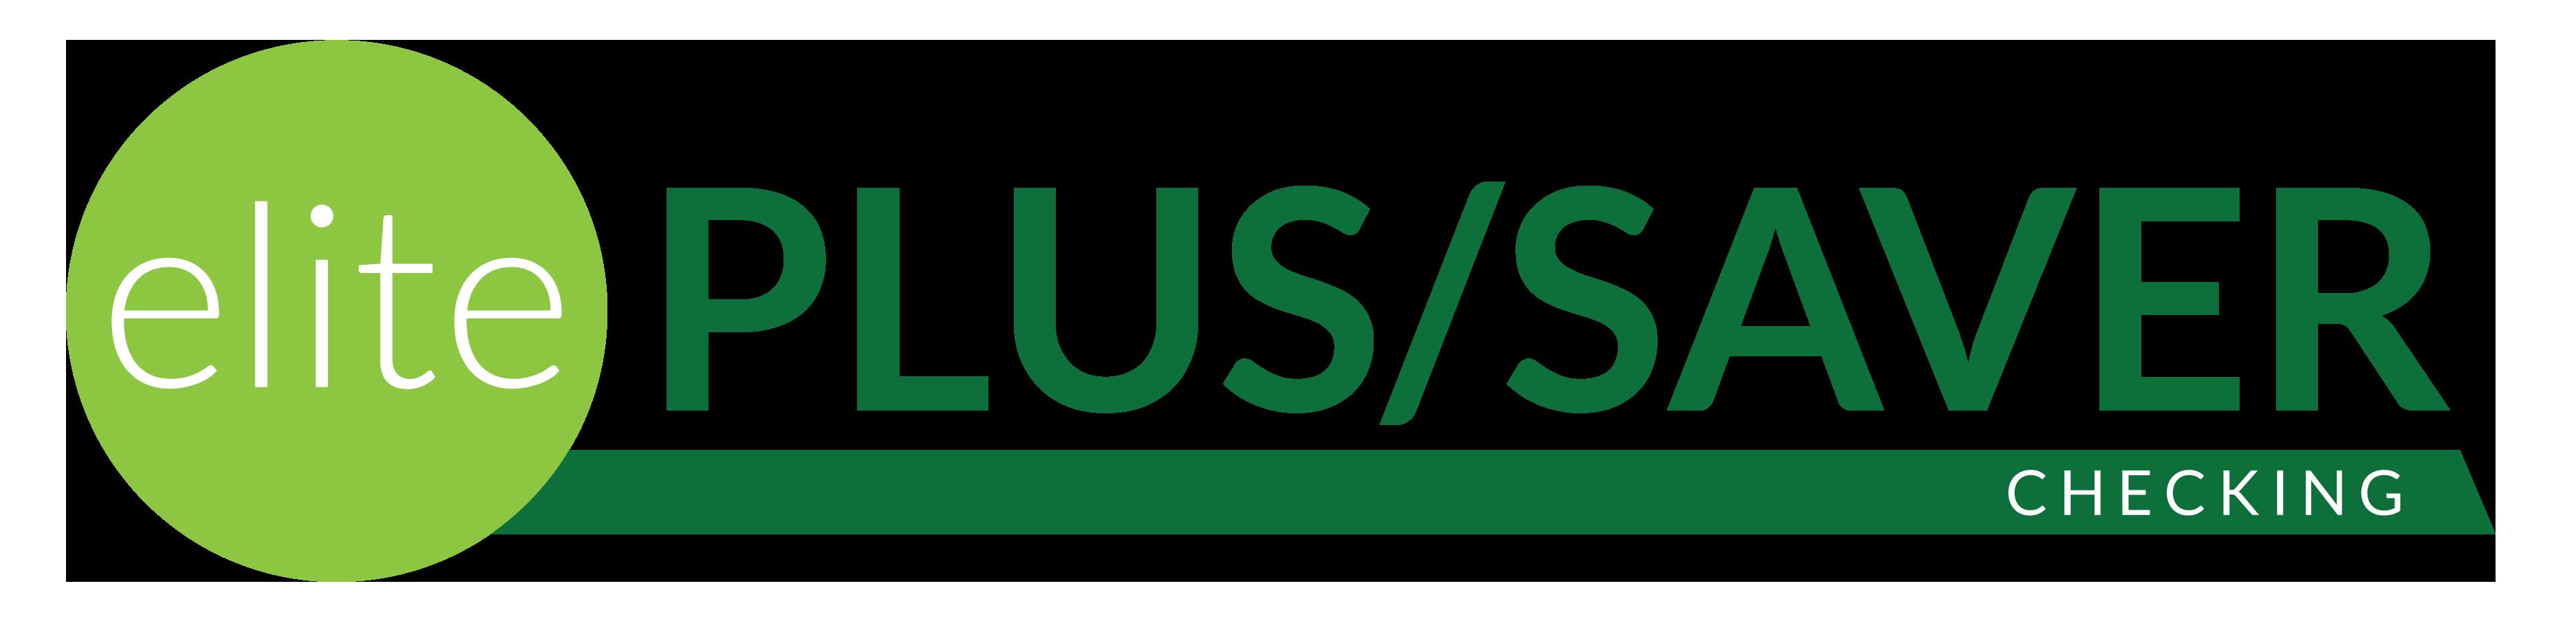 Elite Plus/Saver Checking Logo